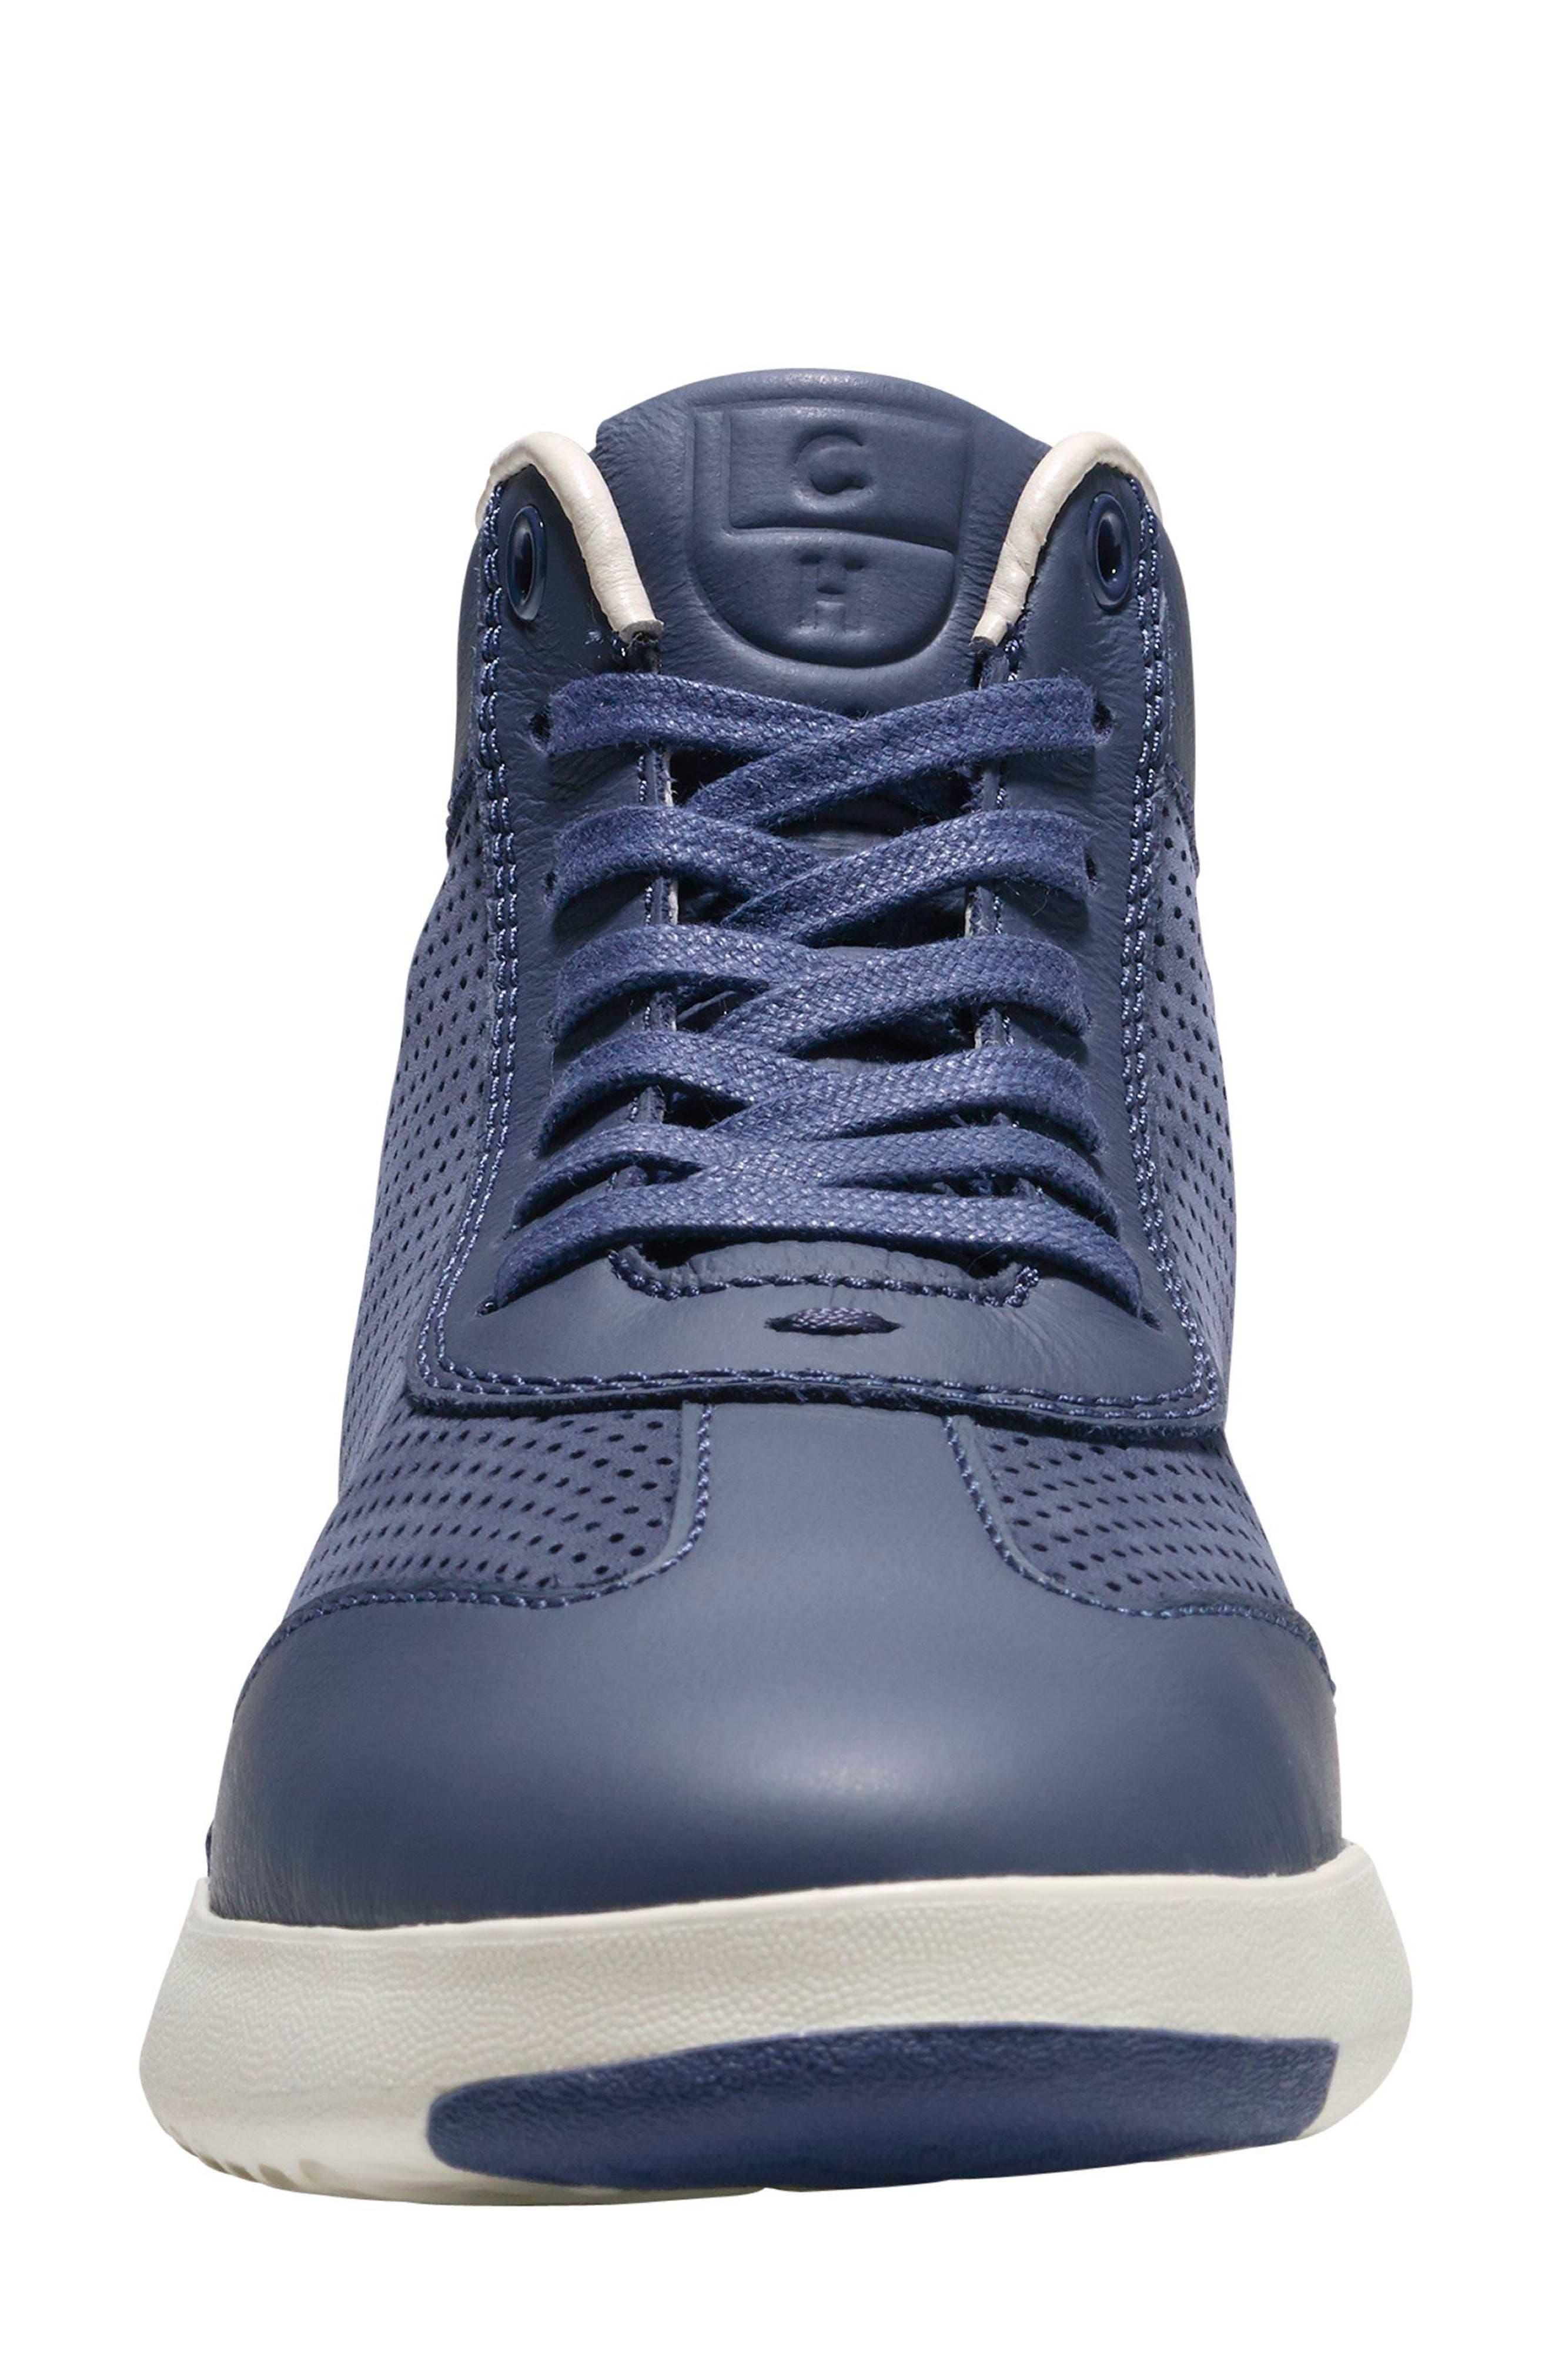 GrandPro High Top Sneaker,                             Alternate thumbnail 9, color,